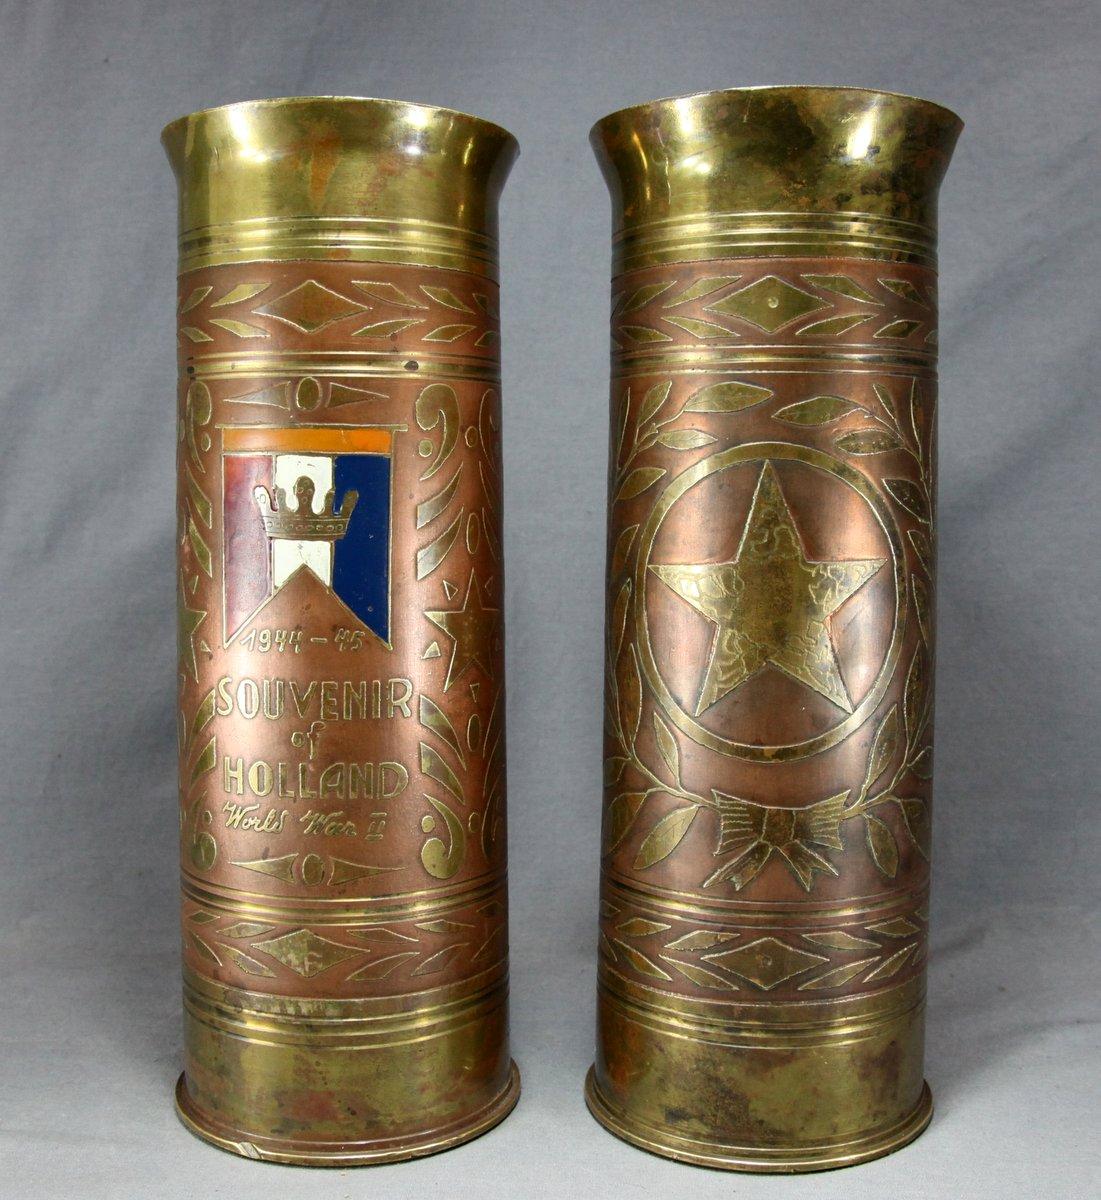 Trench Art Artillery Shells